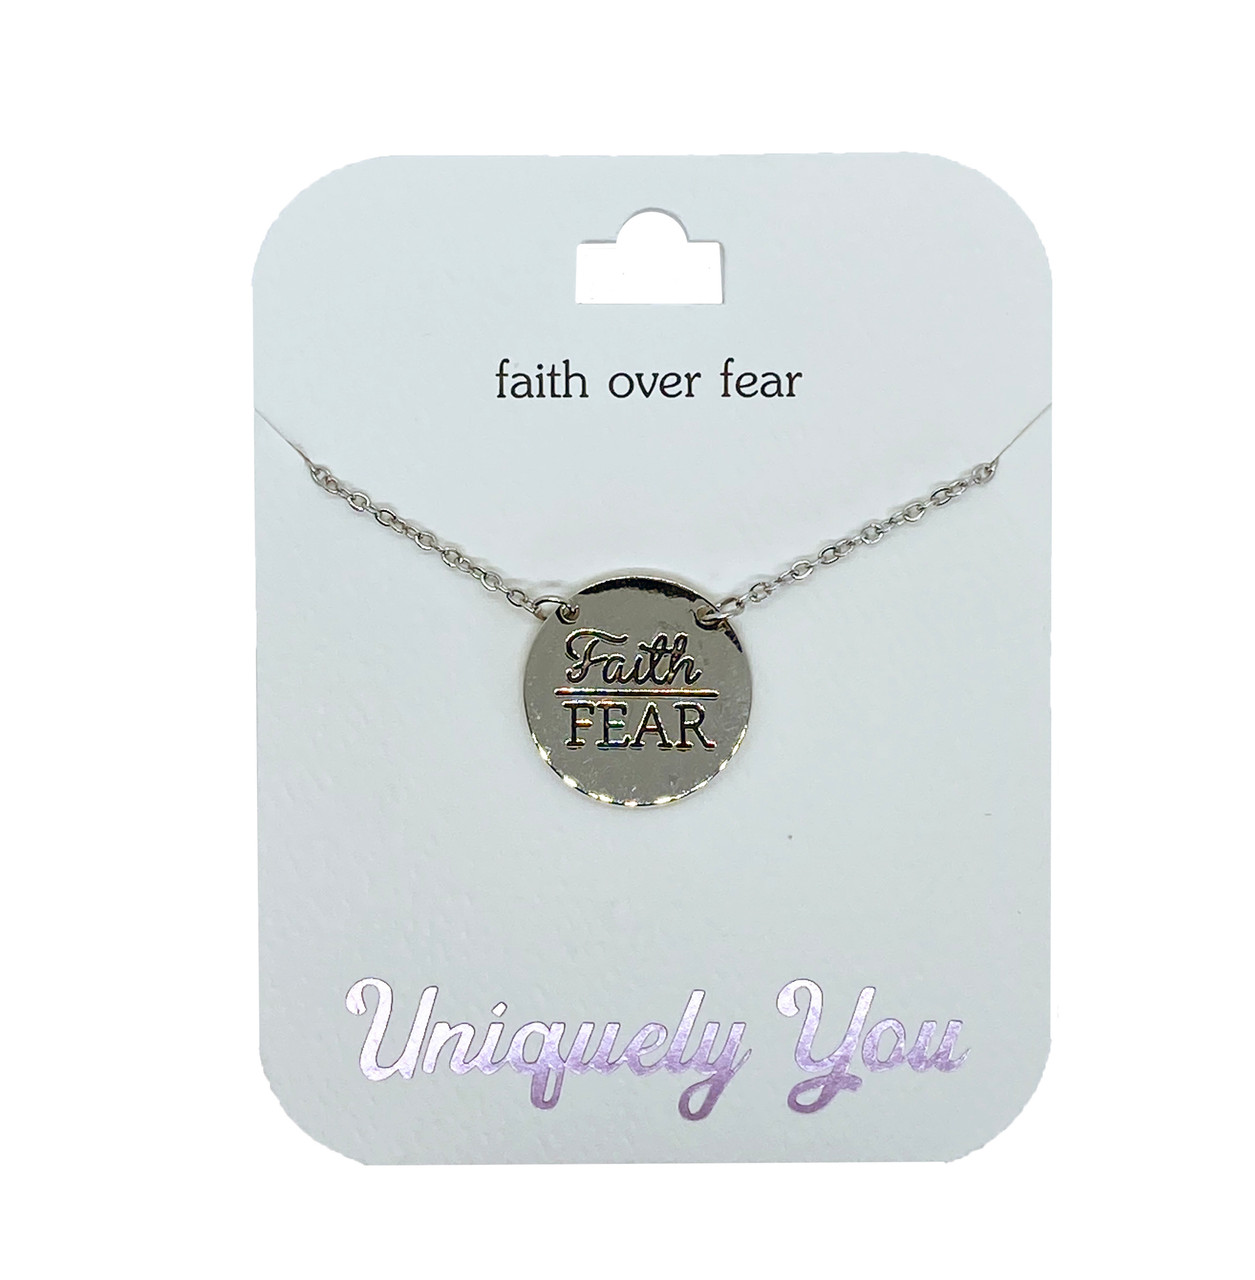 YOU1201 Uniquely You Pendant, Faith over fear